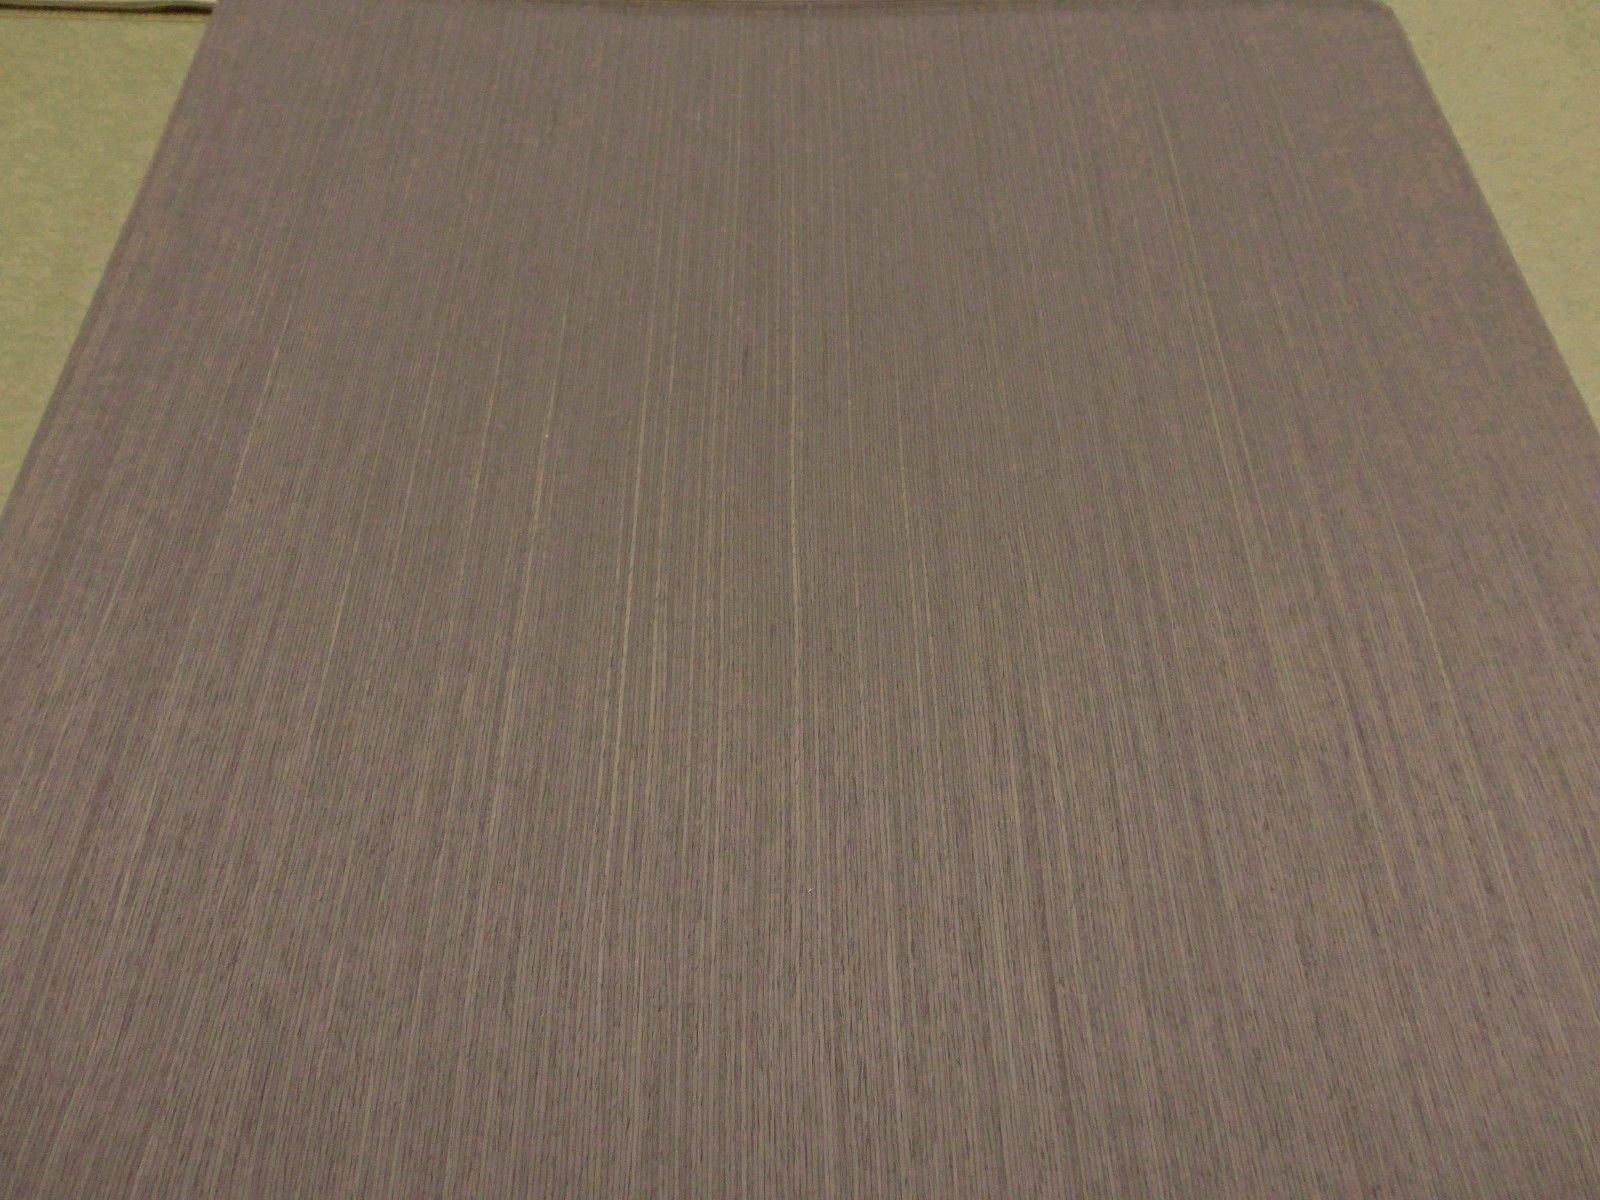 Wenge African composite wood veneer 48'' x 96'' with paper backer 1/40'' (# 900)